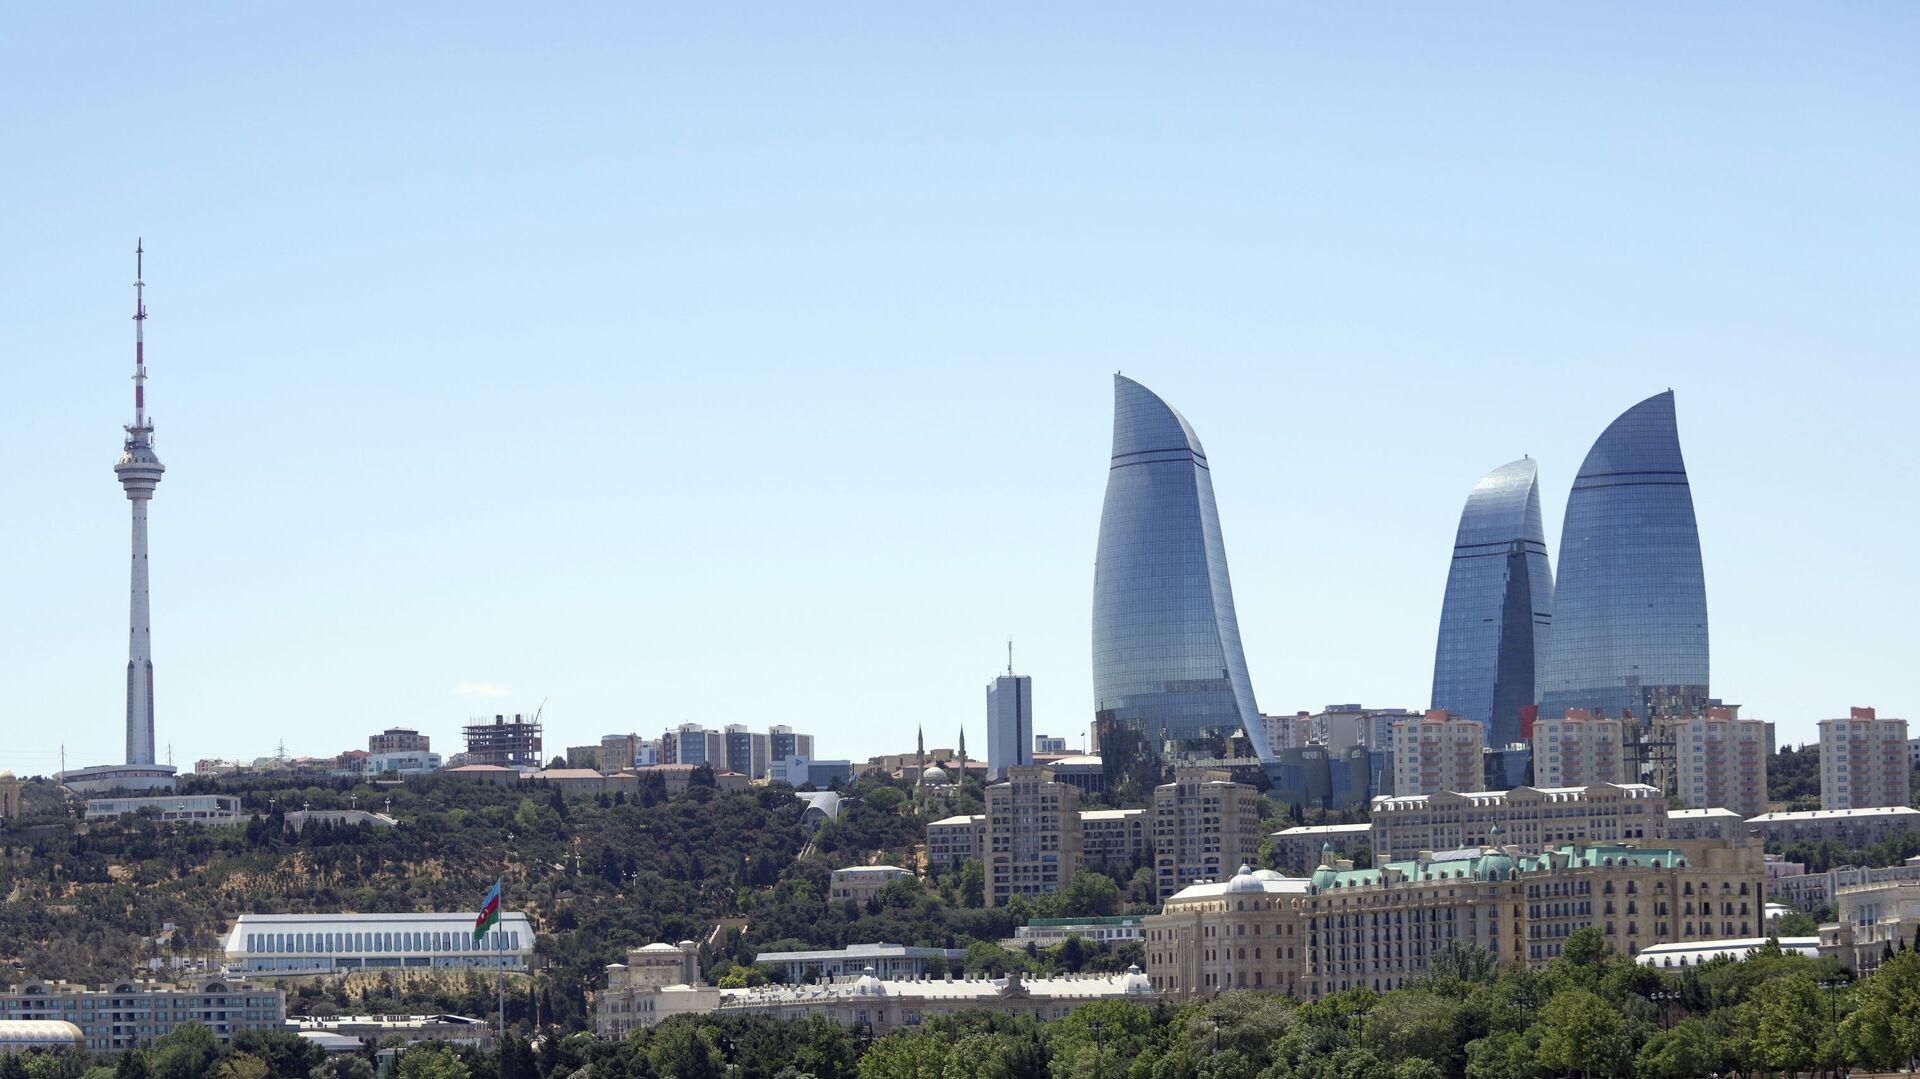 Вид на Flame Towers (Пламенные башни) в Баку, фото из архива - Sputnik Азербайджан, 1920, 11.08.2021